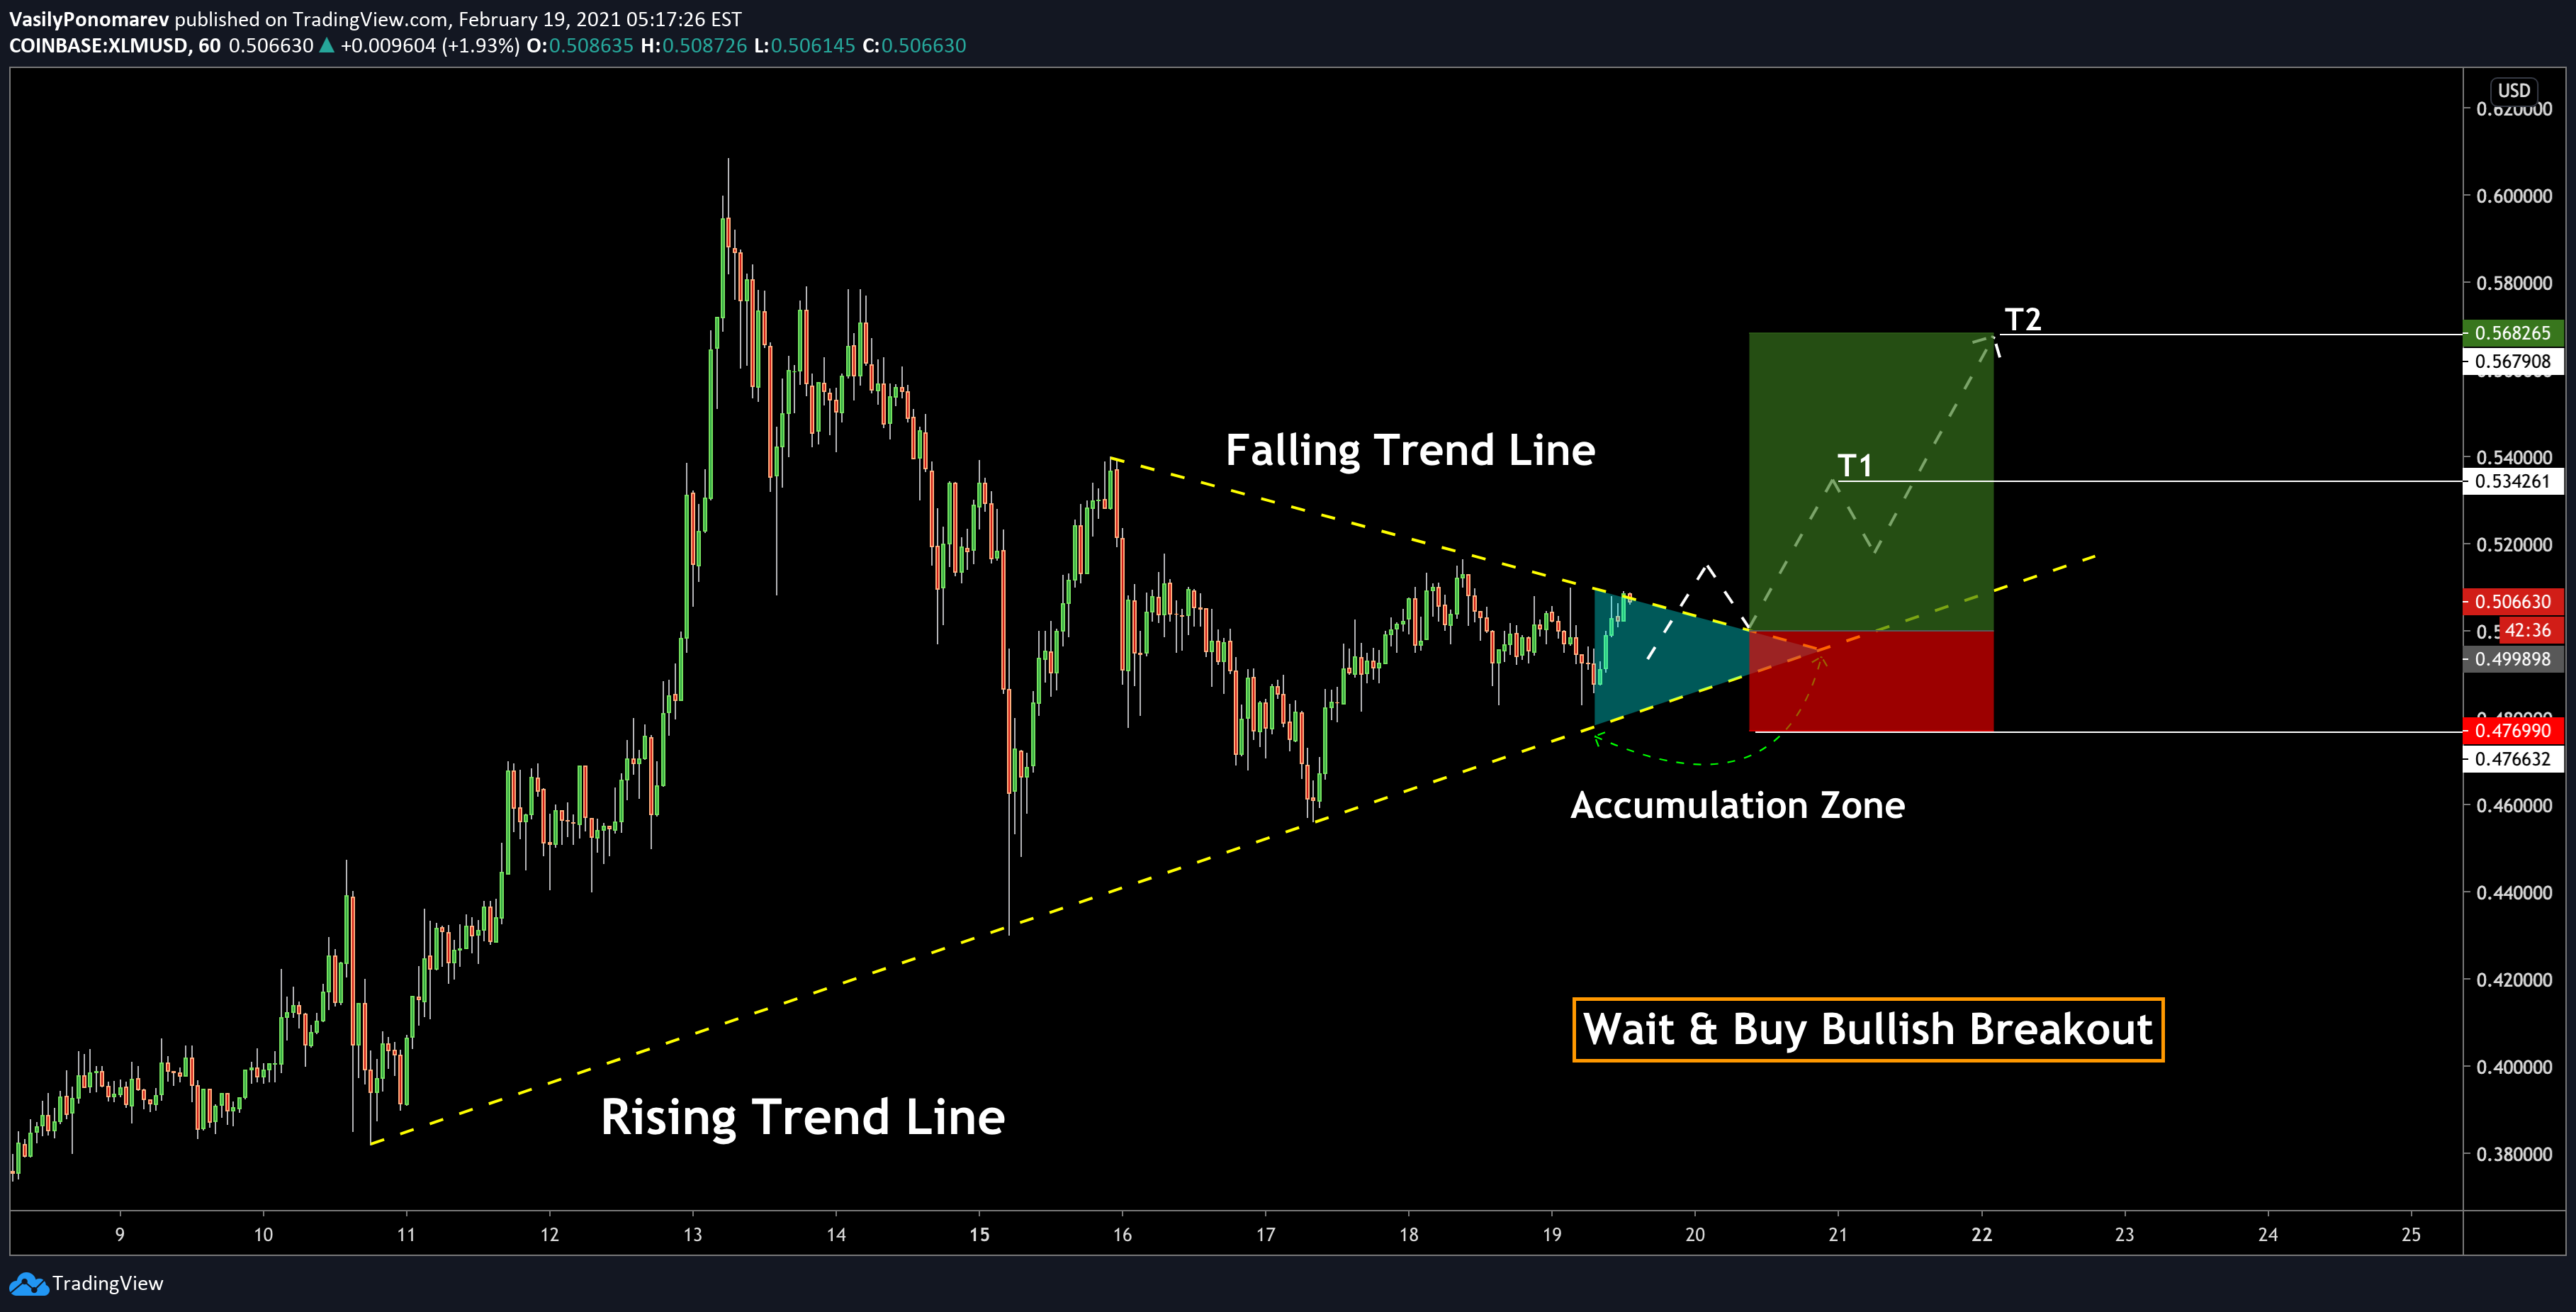 Xlmusd How To Catch Bullish Wave لـ Coinbase Xlmusd بواسطة Vasilyponomarev Tradingview